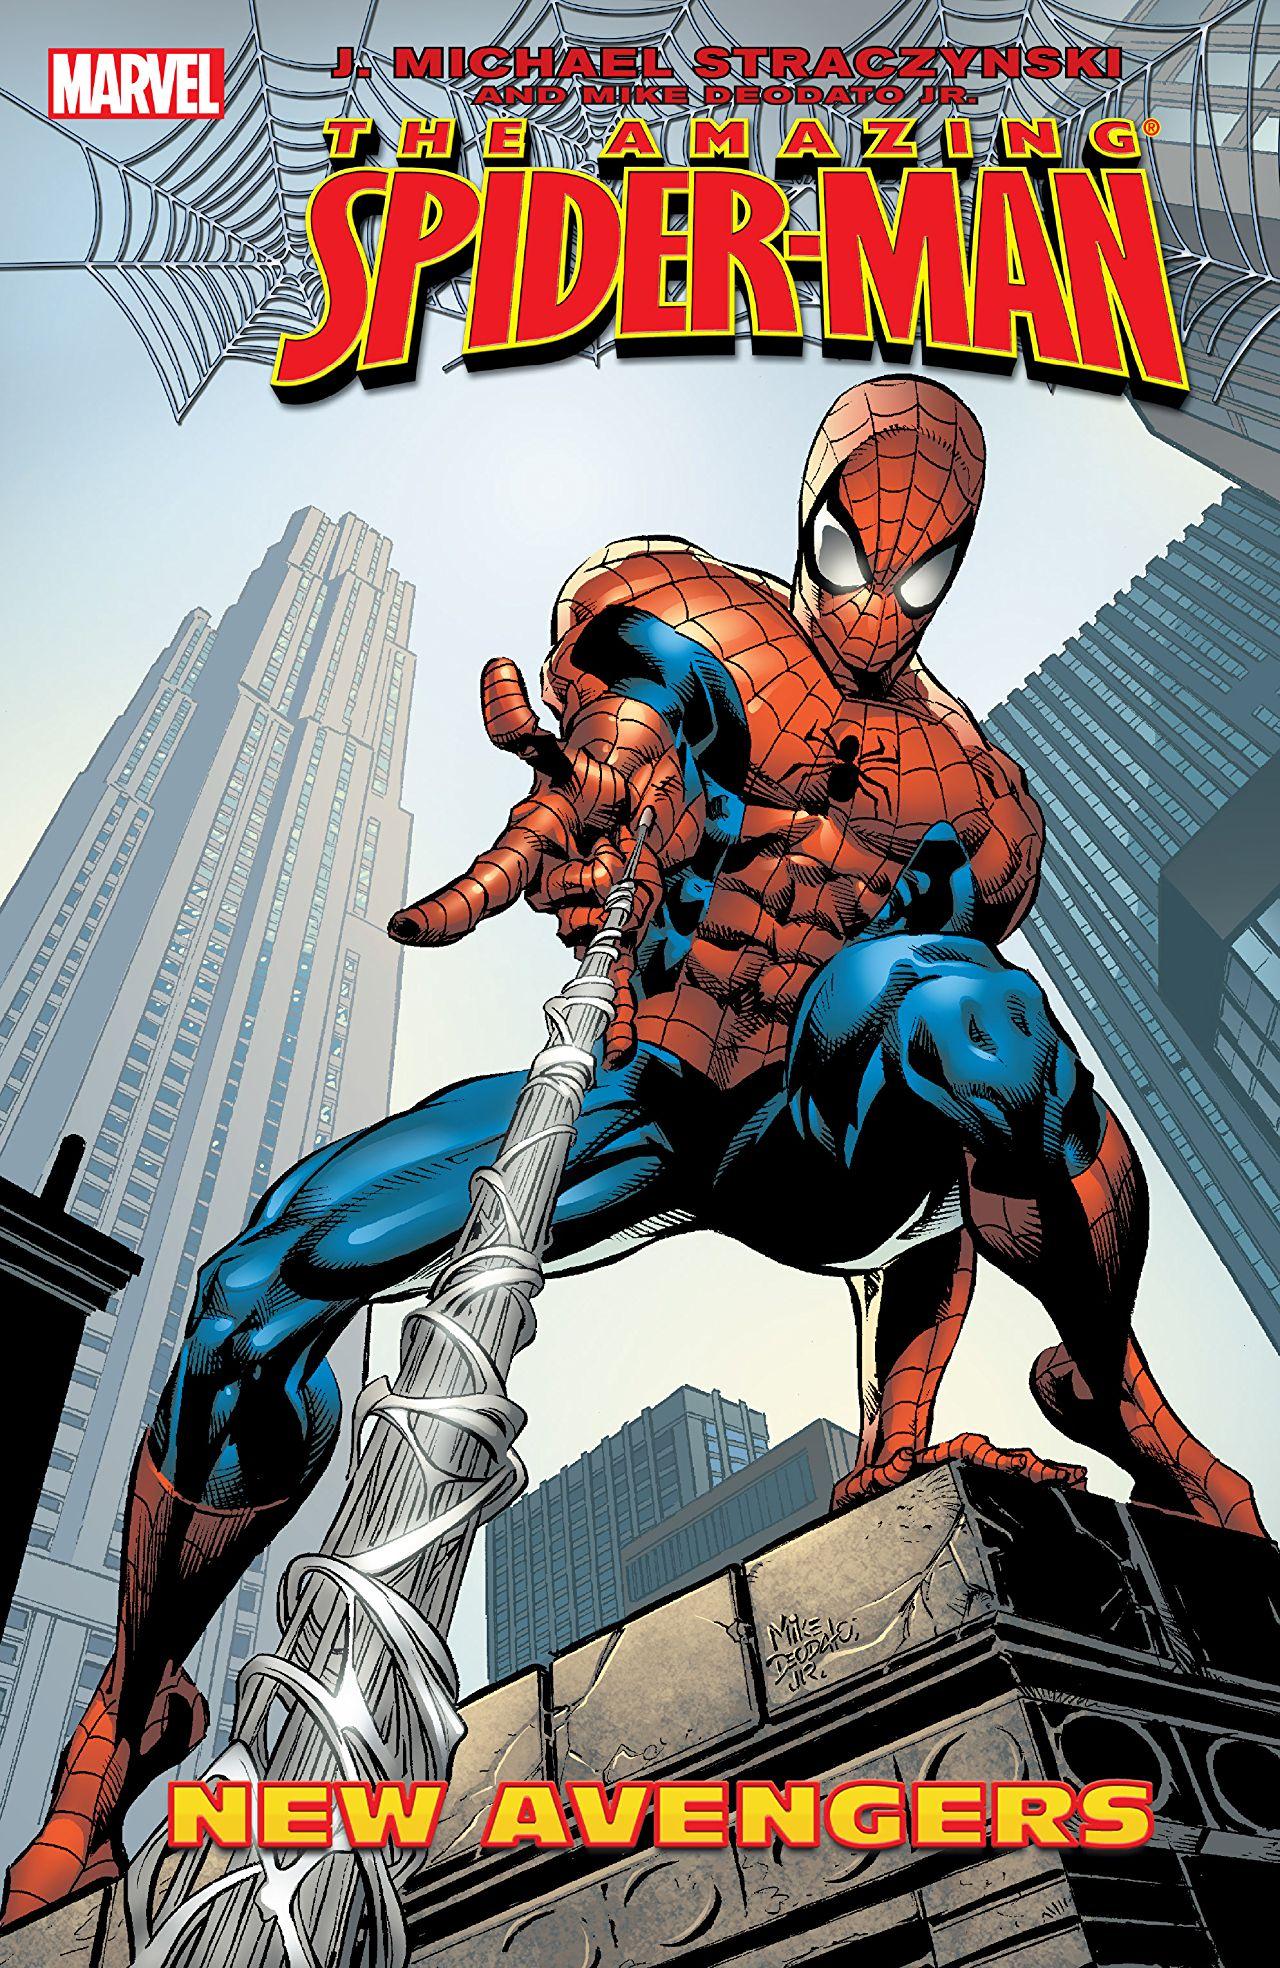 Amazing Spider-Man TPB Vol 1 10: New Avengers